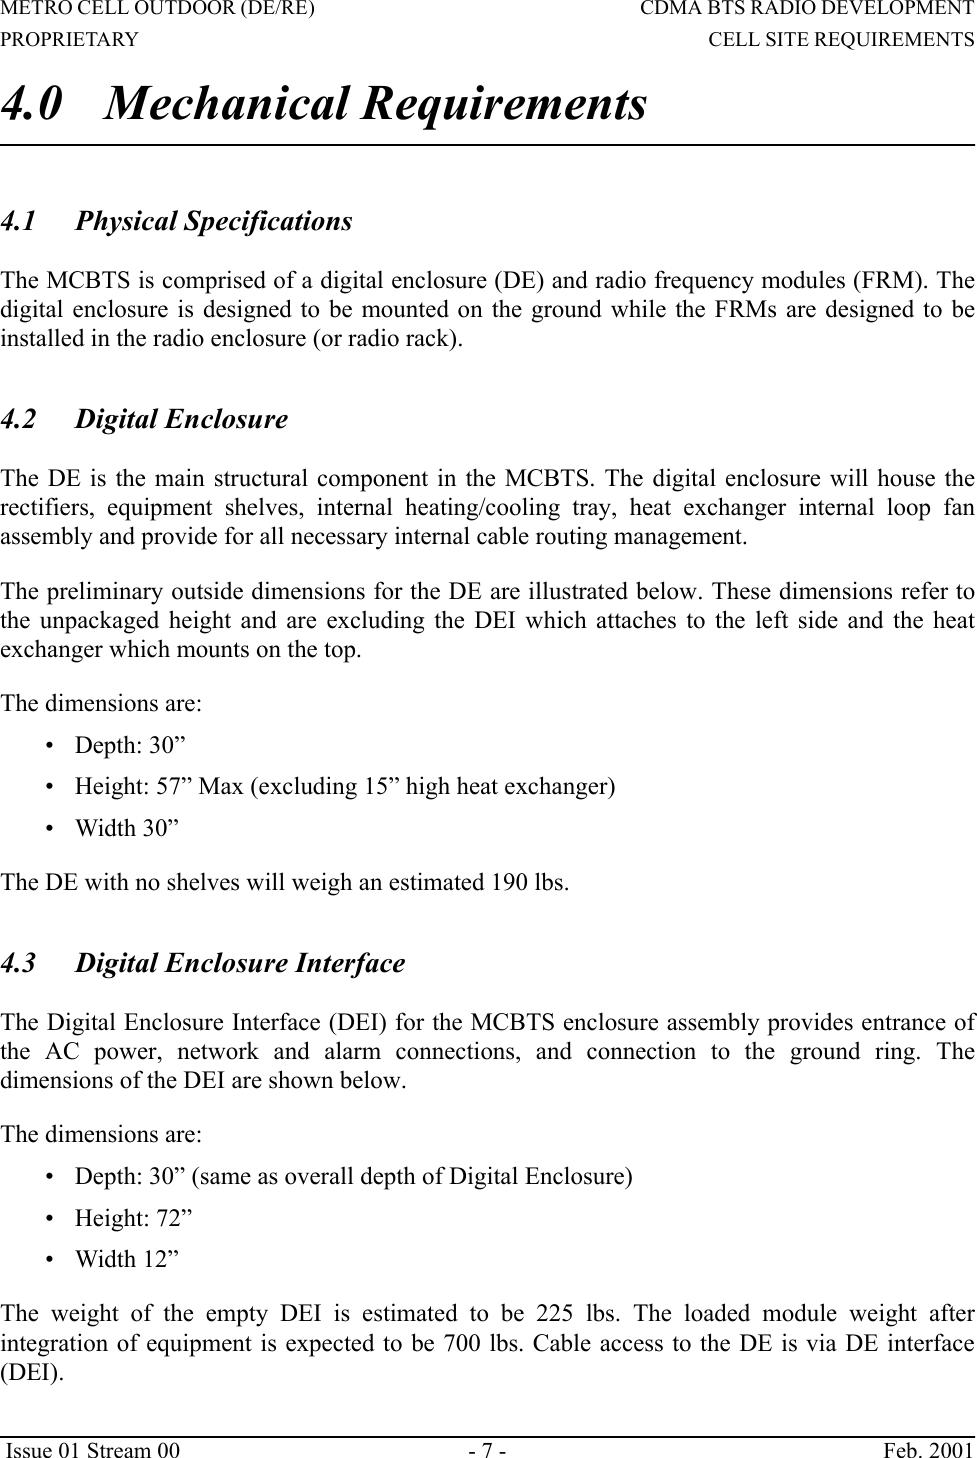 northern telecom meridian phone manual